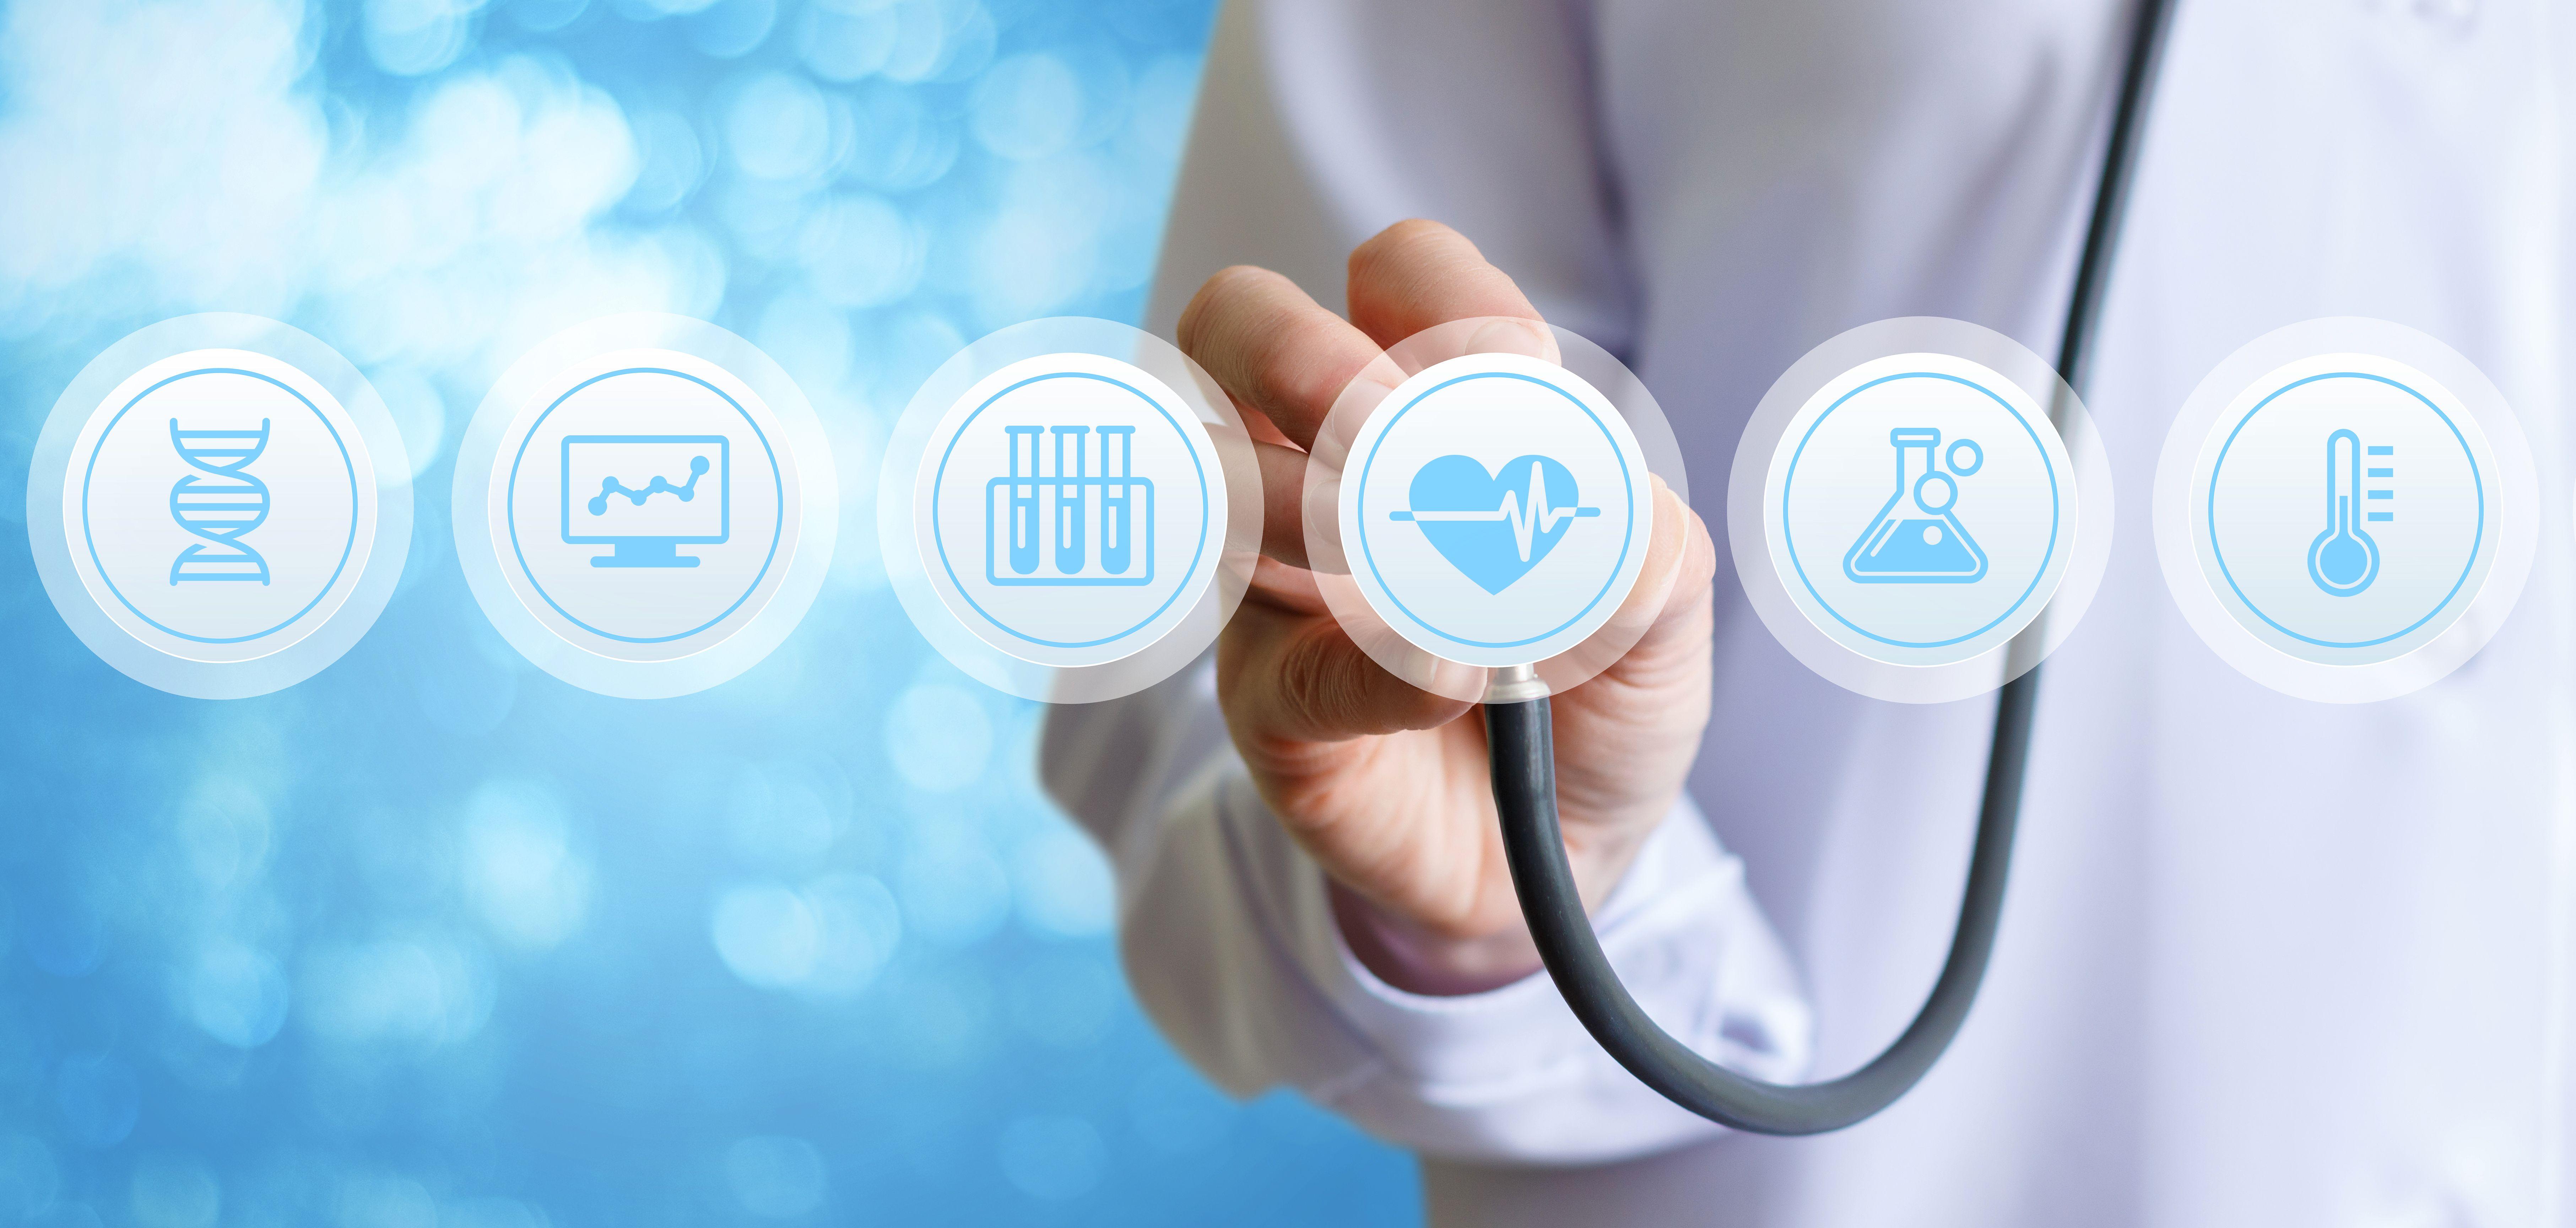 Farmacia Ortopedia en Segur de Calafell